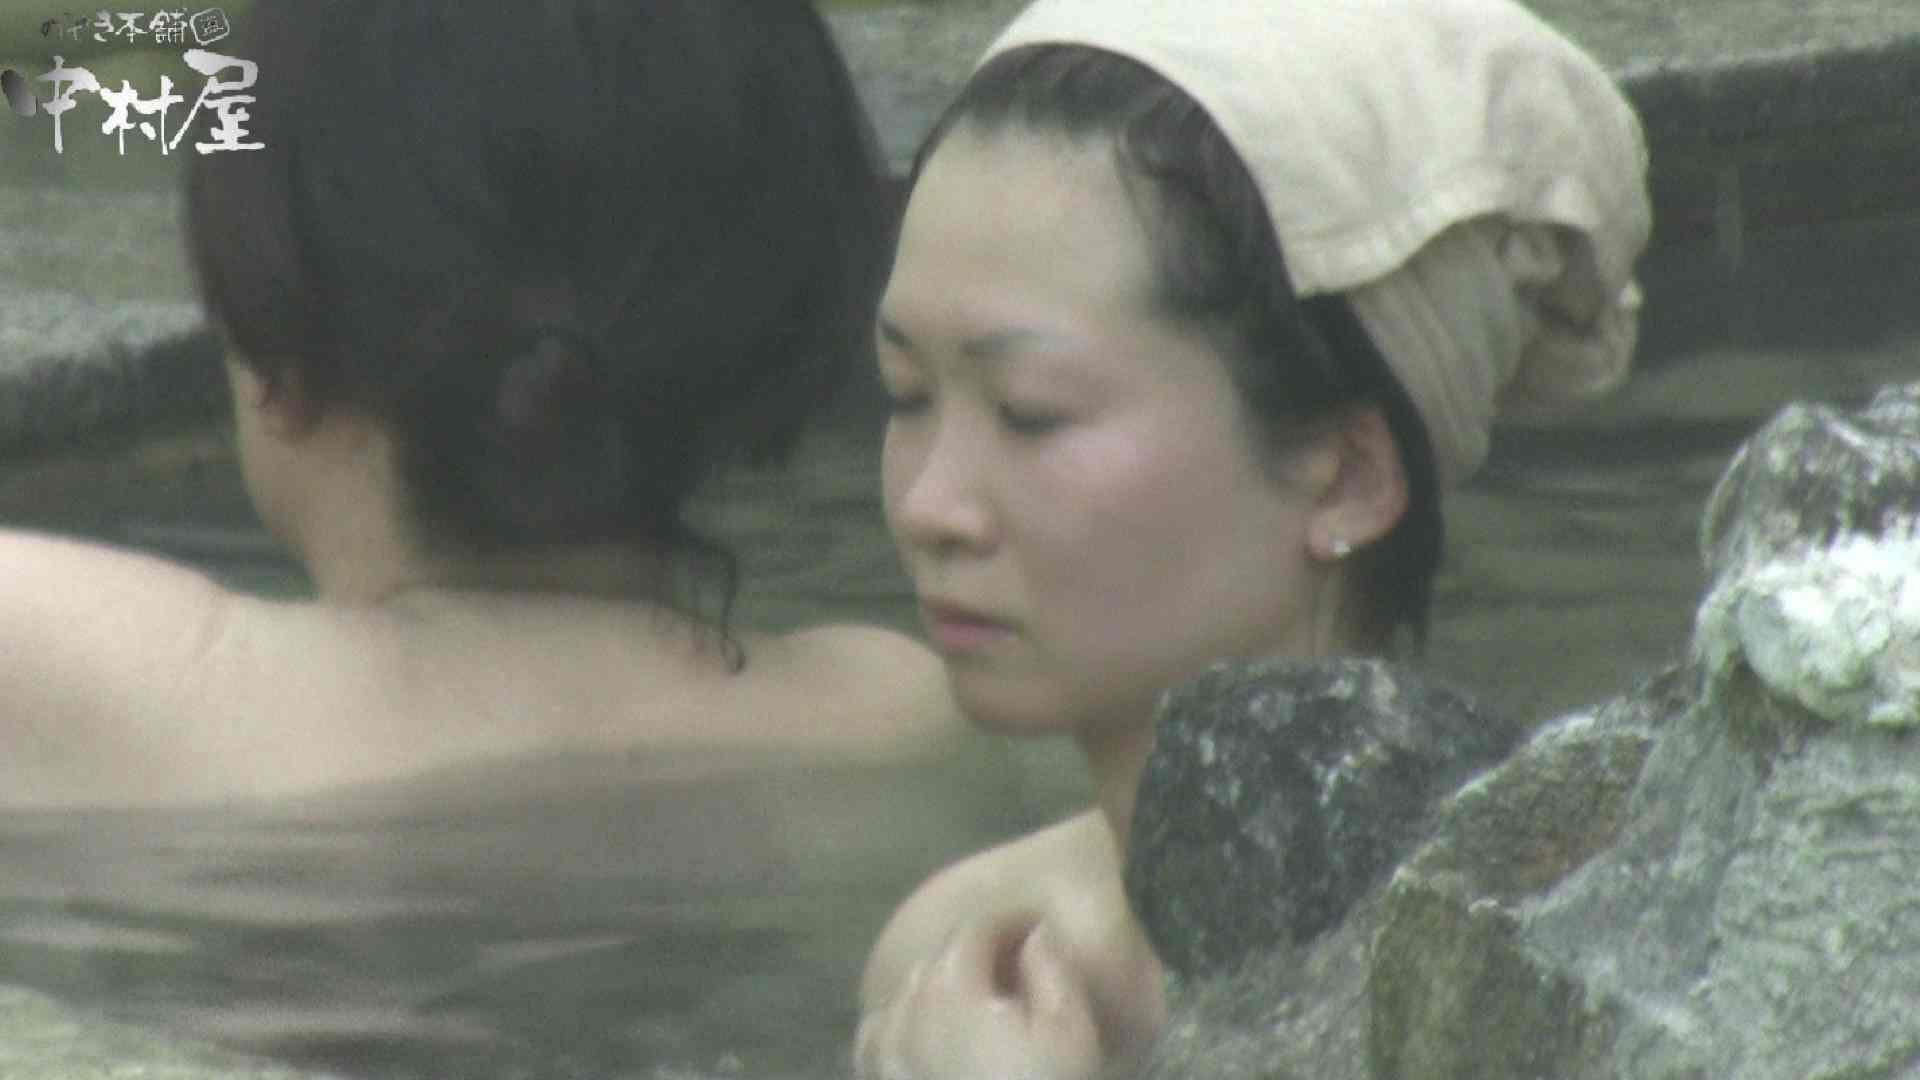 Aquaな露天風呂Vol.906 OLセックス 盗撮オマンコ無修正動画無料 92画像 92